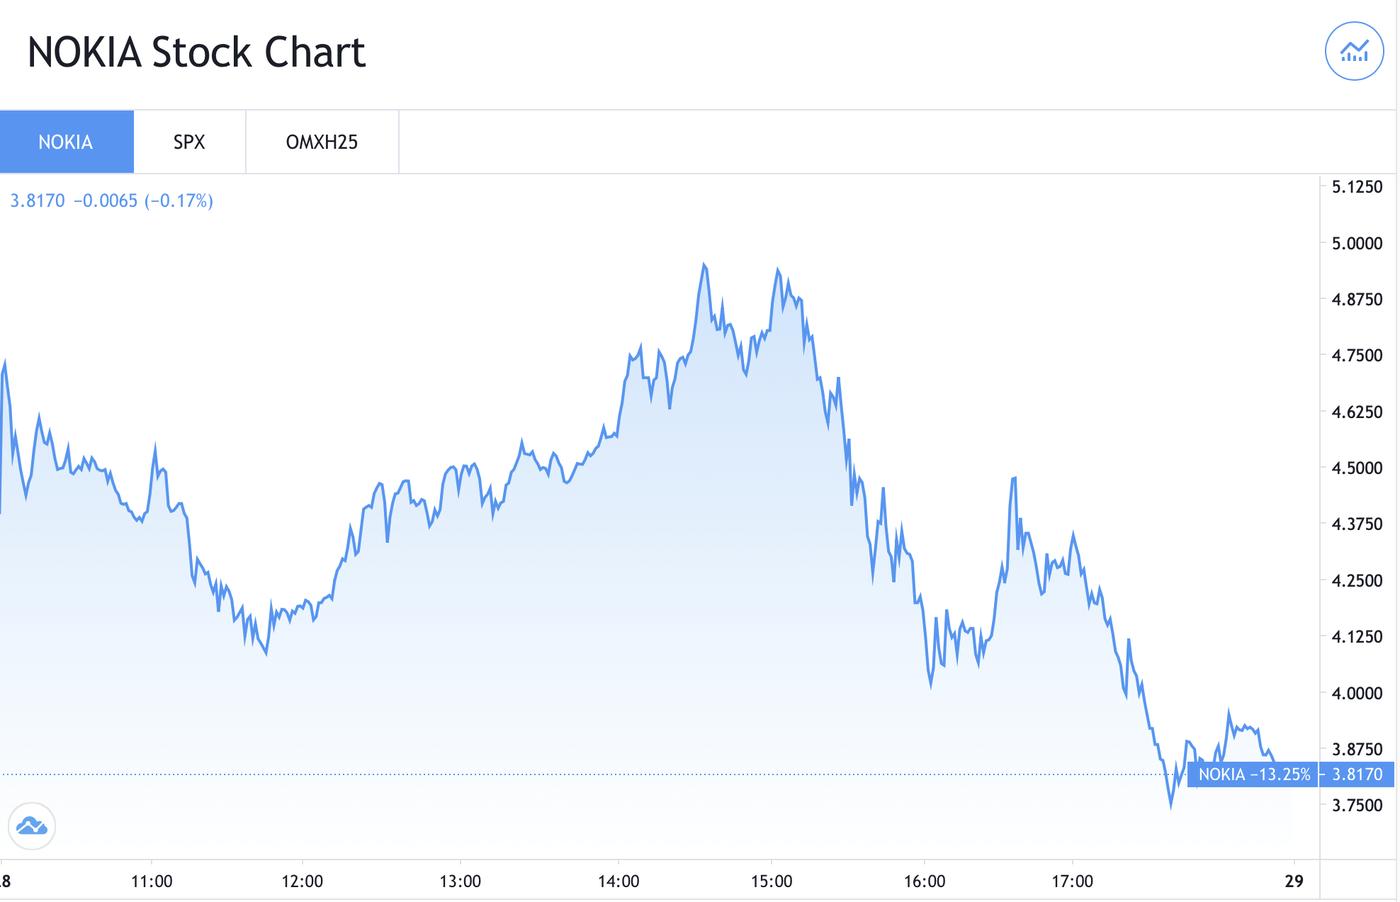 Nokia-price-chart-trading-view